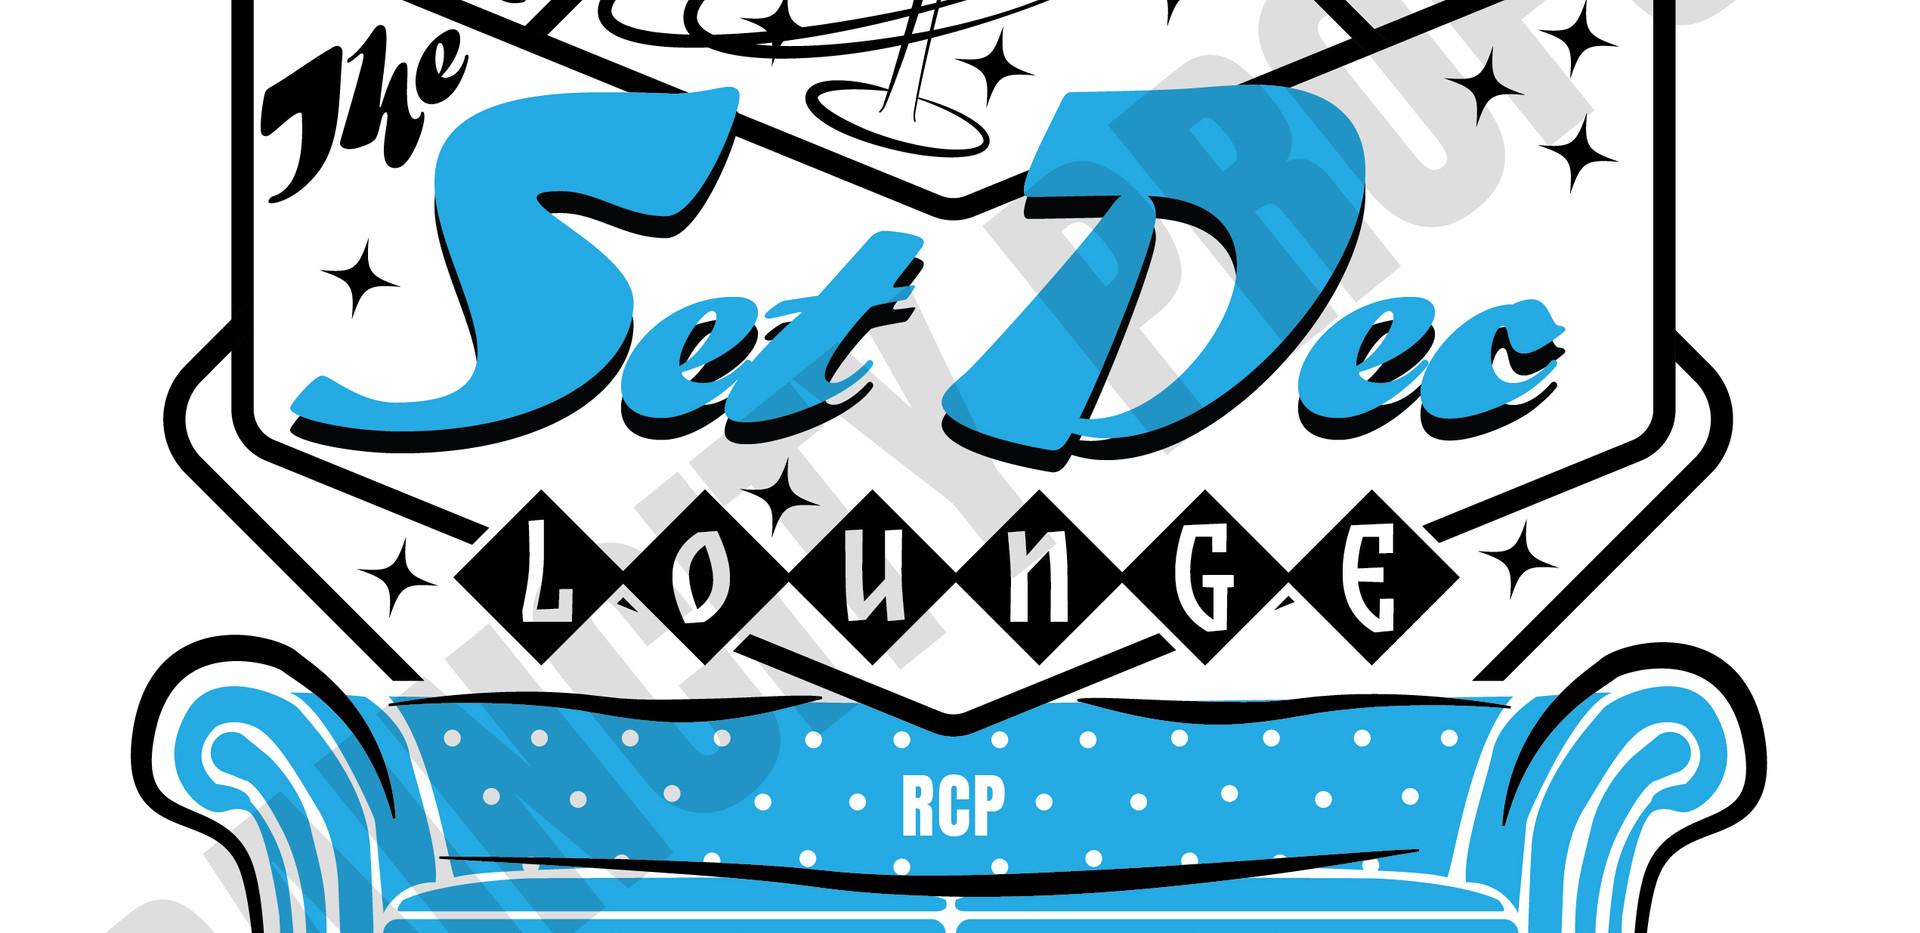 Set Dec Lounge Design